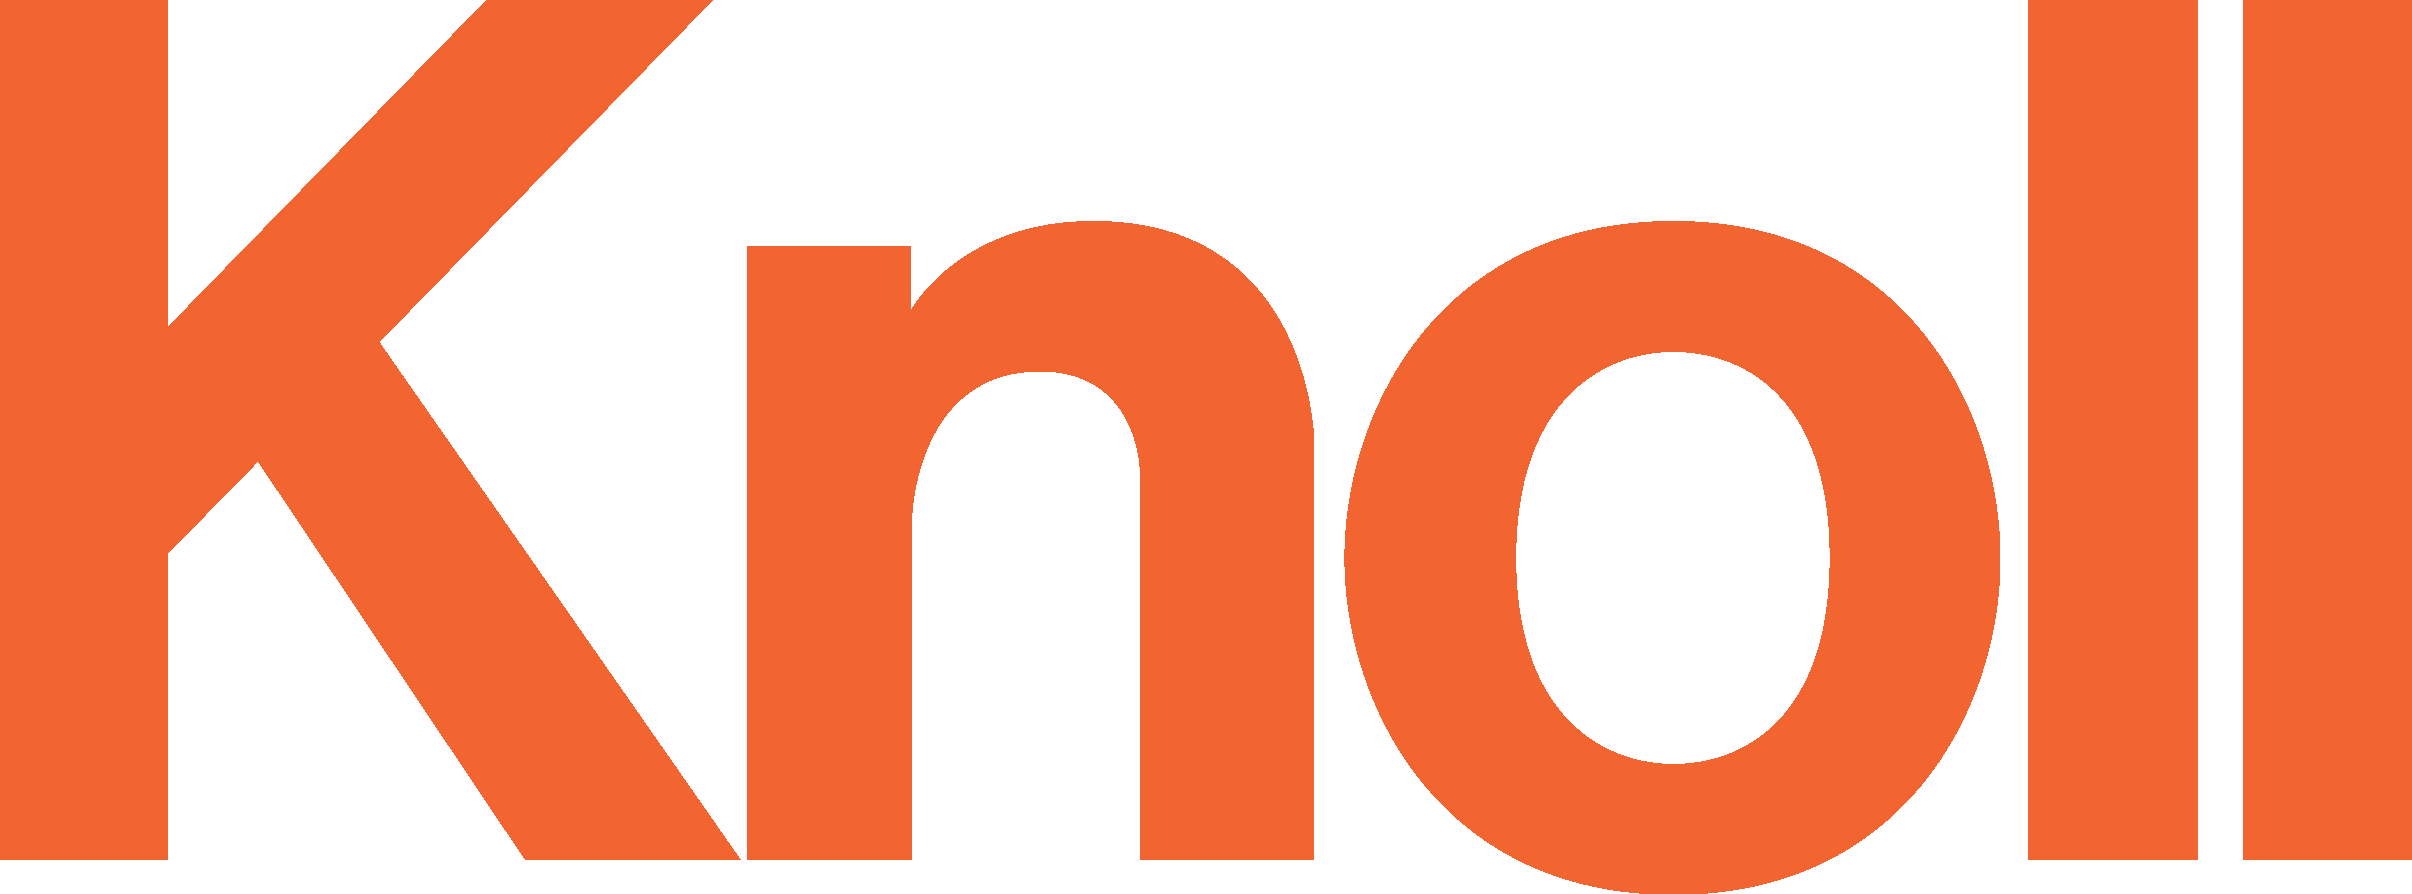 Knoll Logo png